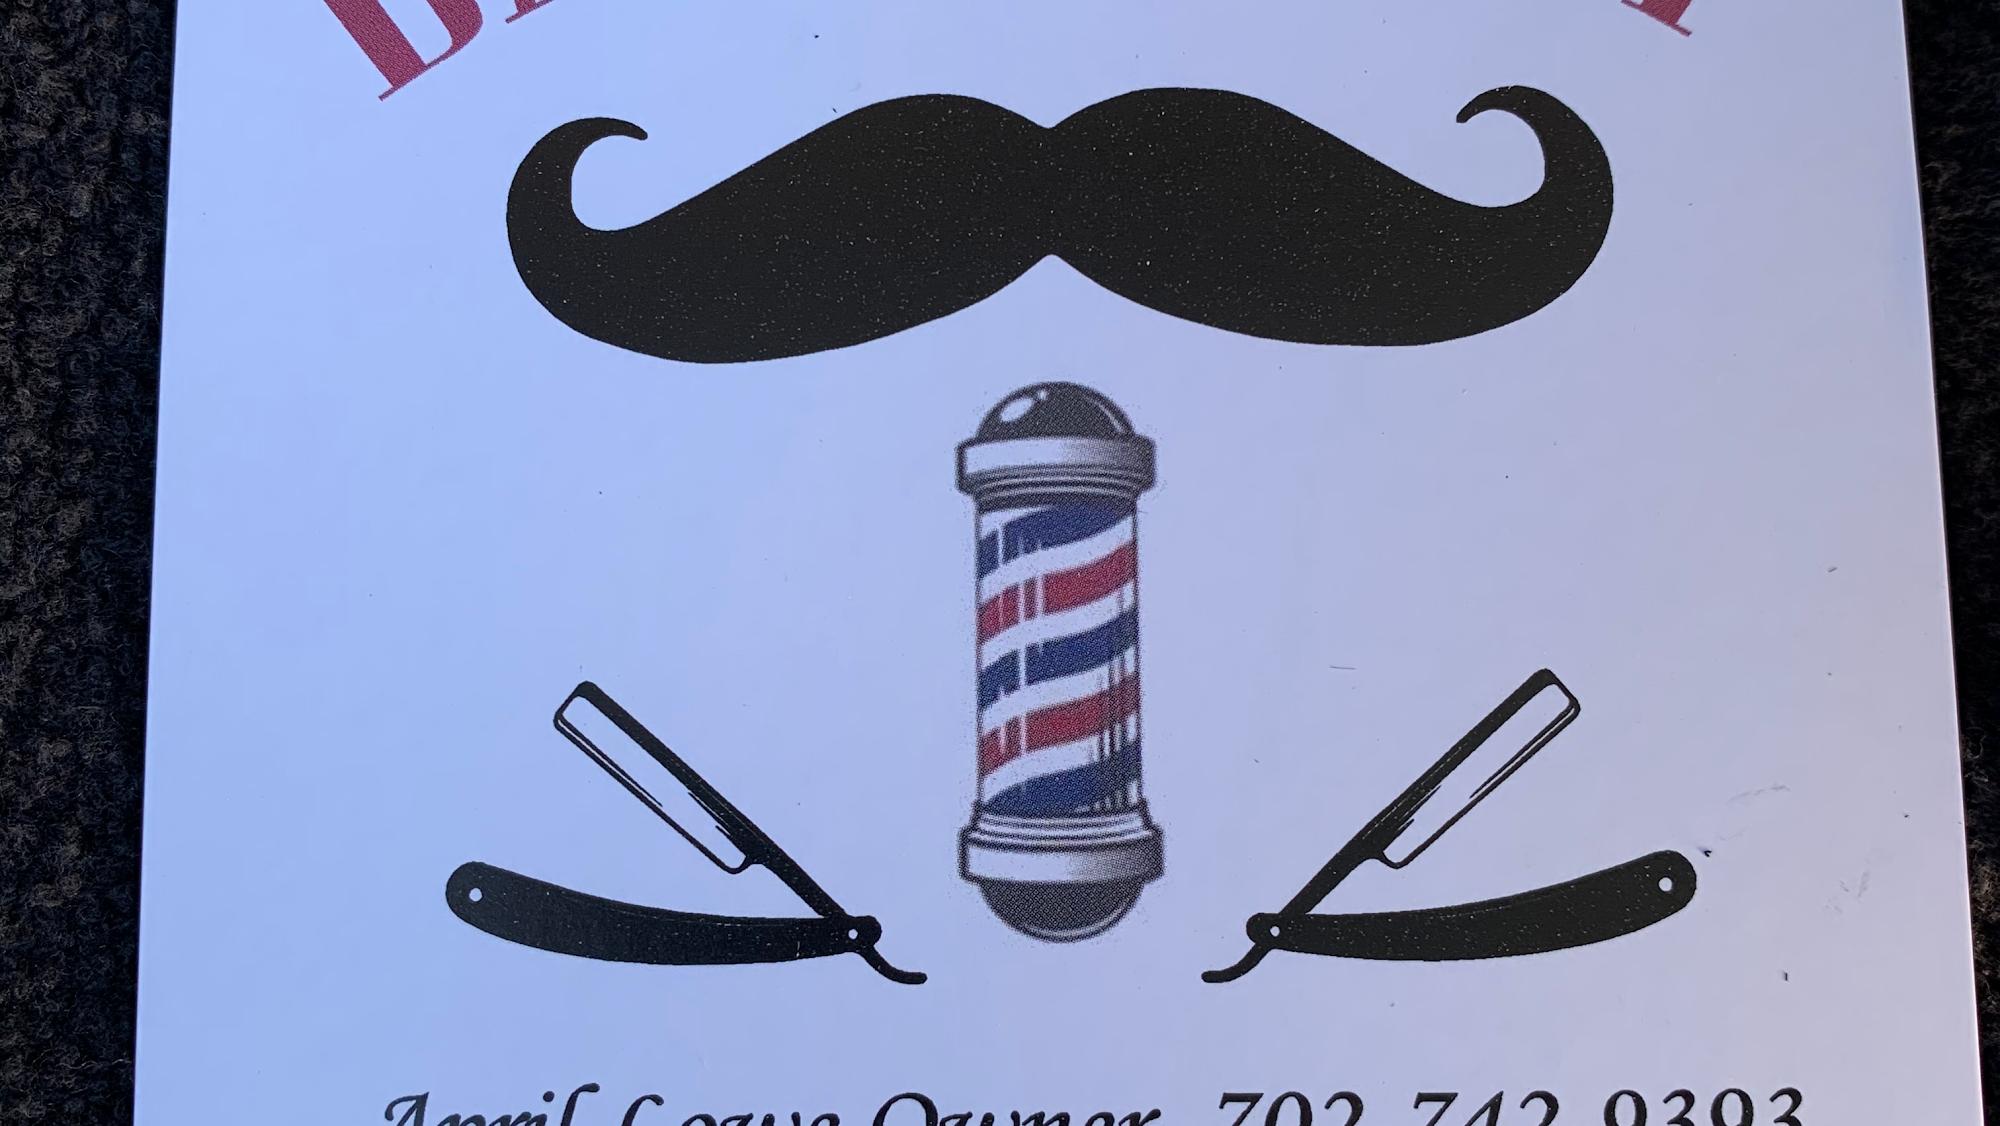 Sharper Image Barbershop 1840 E Calvada Blvd Suite 12, Pahrump